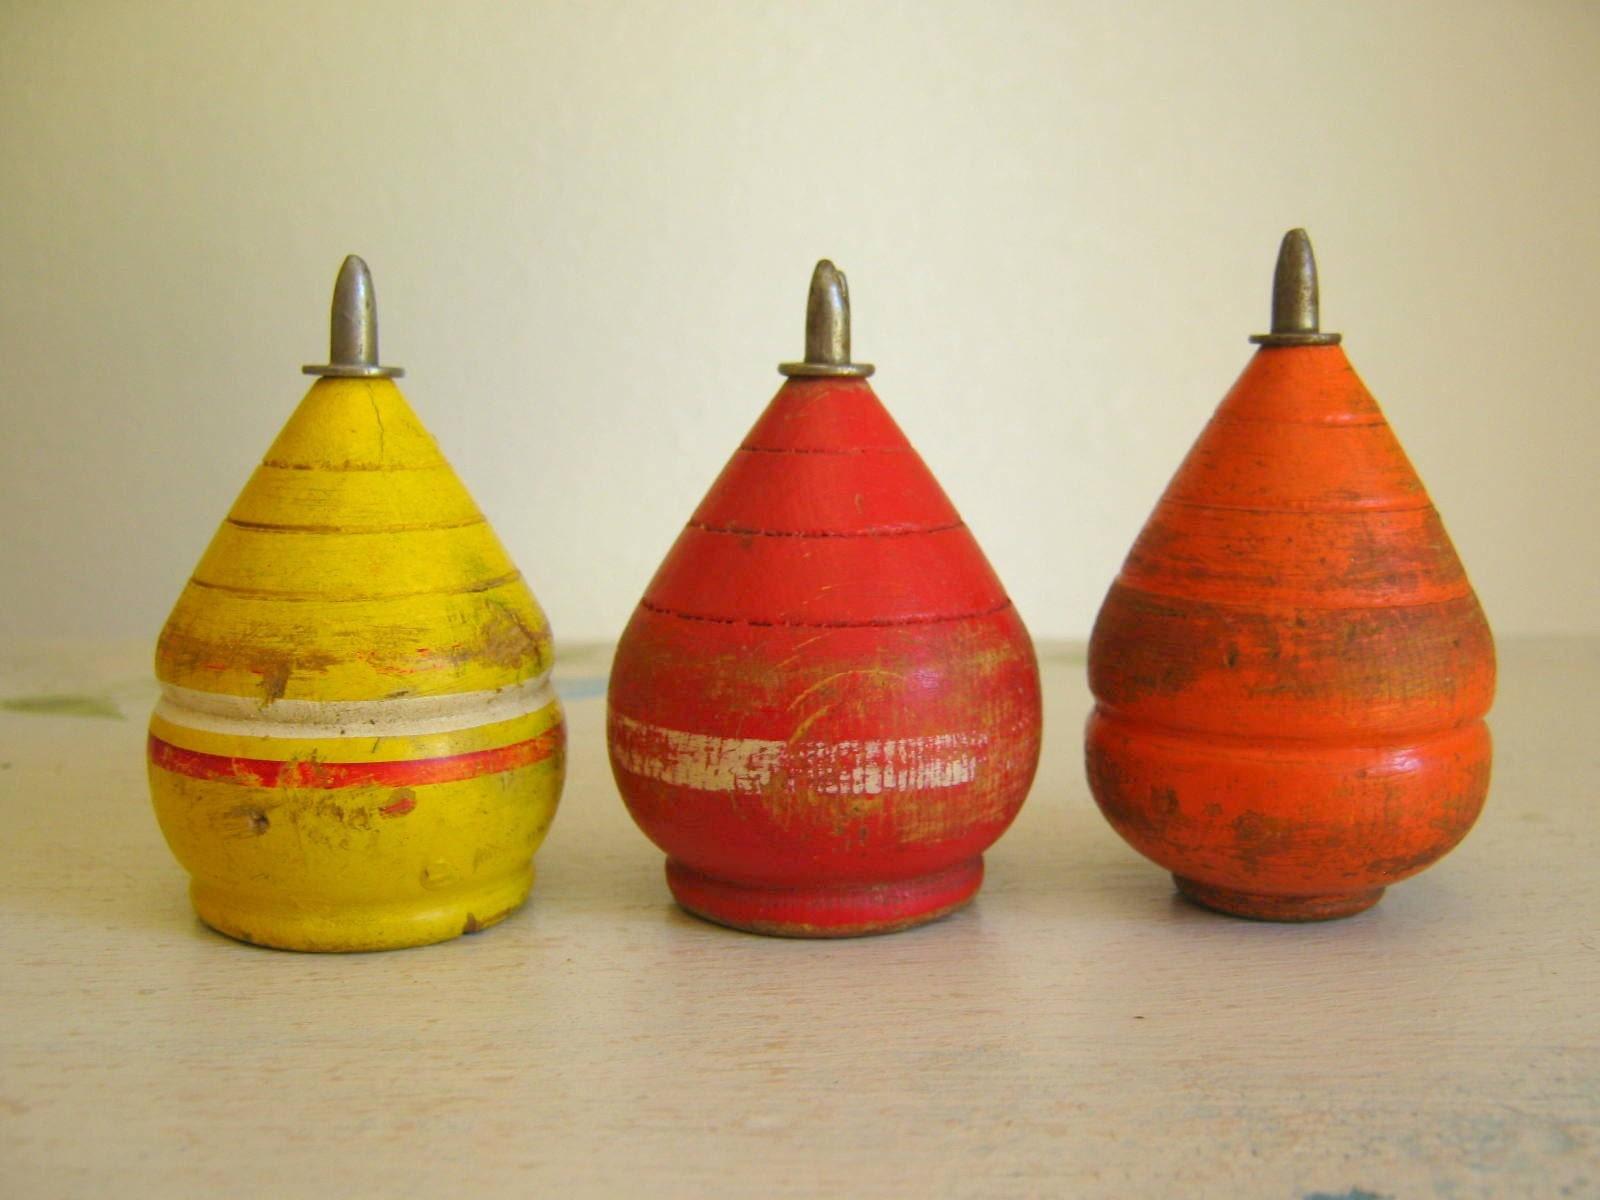 Antique Vintage Wooden Spinning Tops Children's Toy